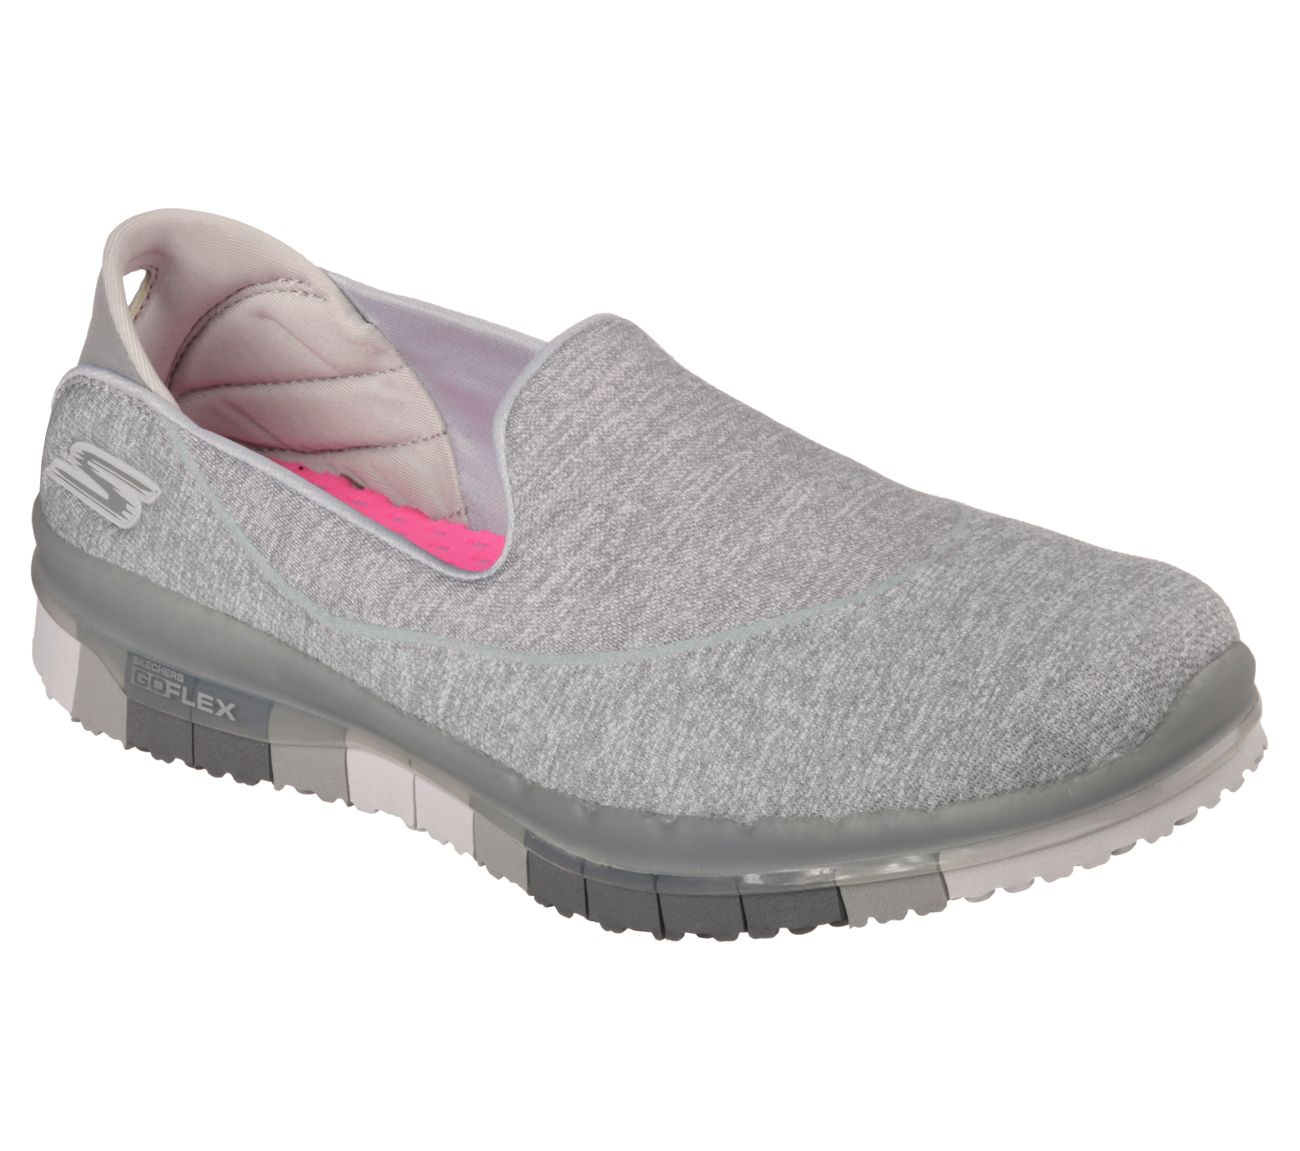 14010 NAVY GRAY Skechers shoes Go Flex Walk Women Slip On